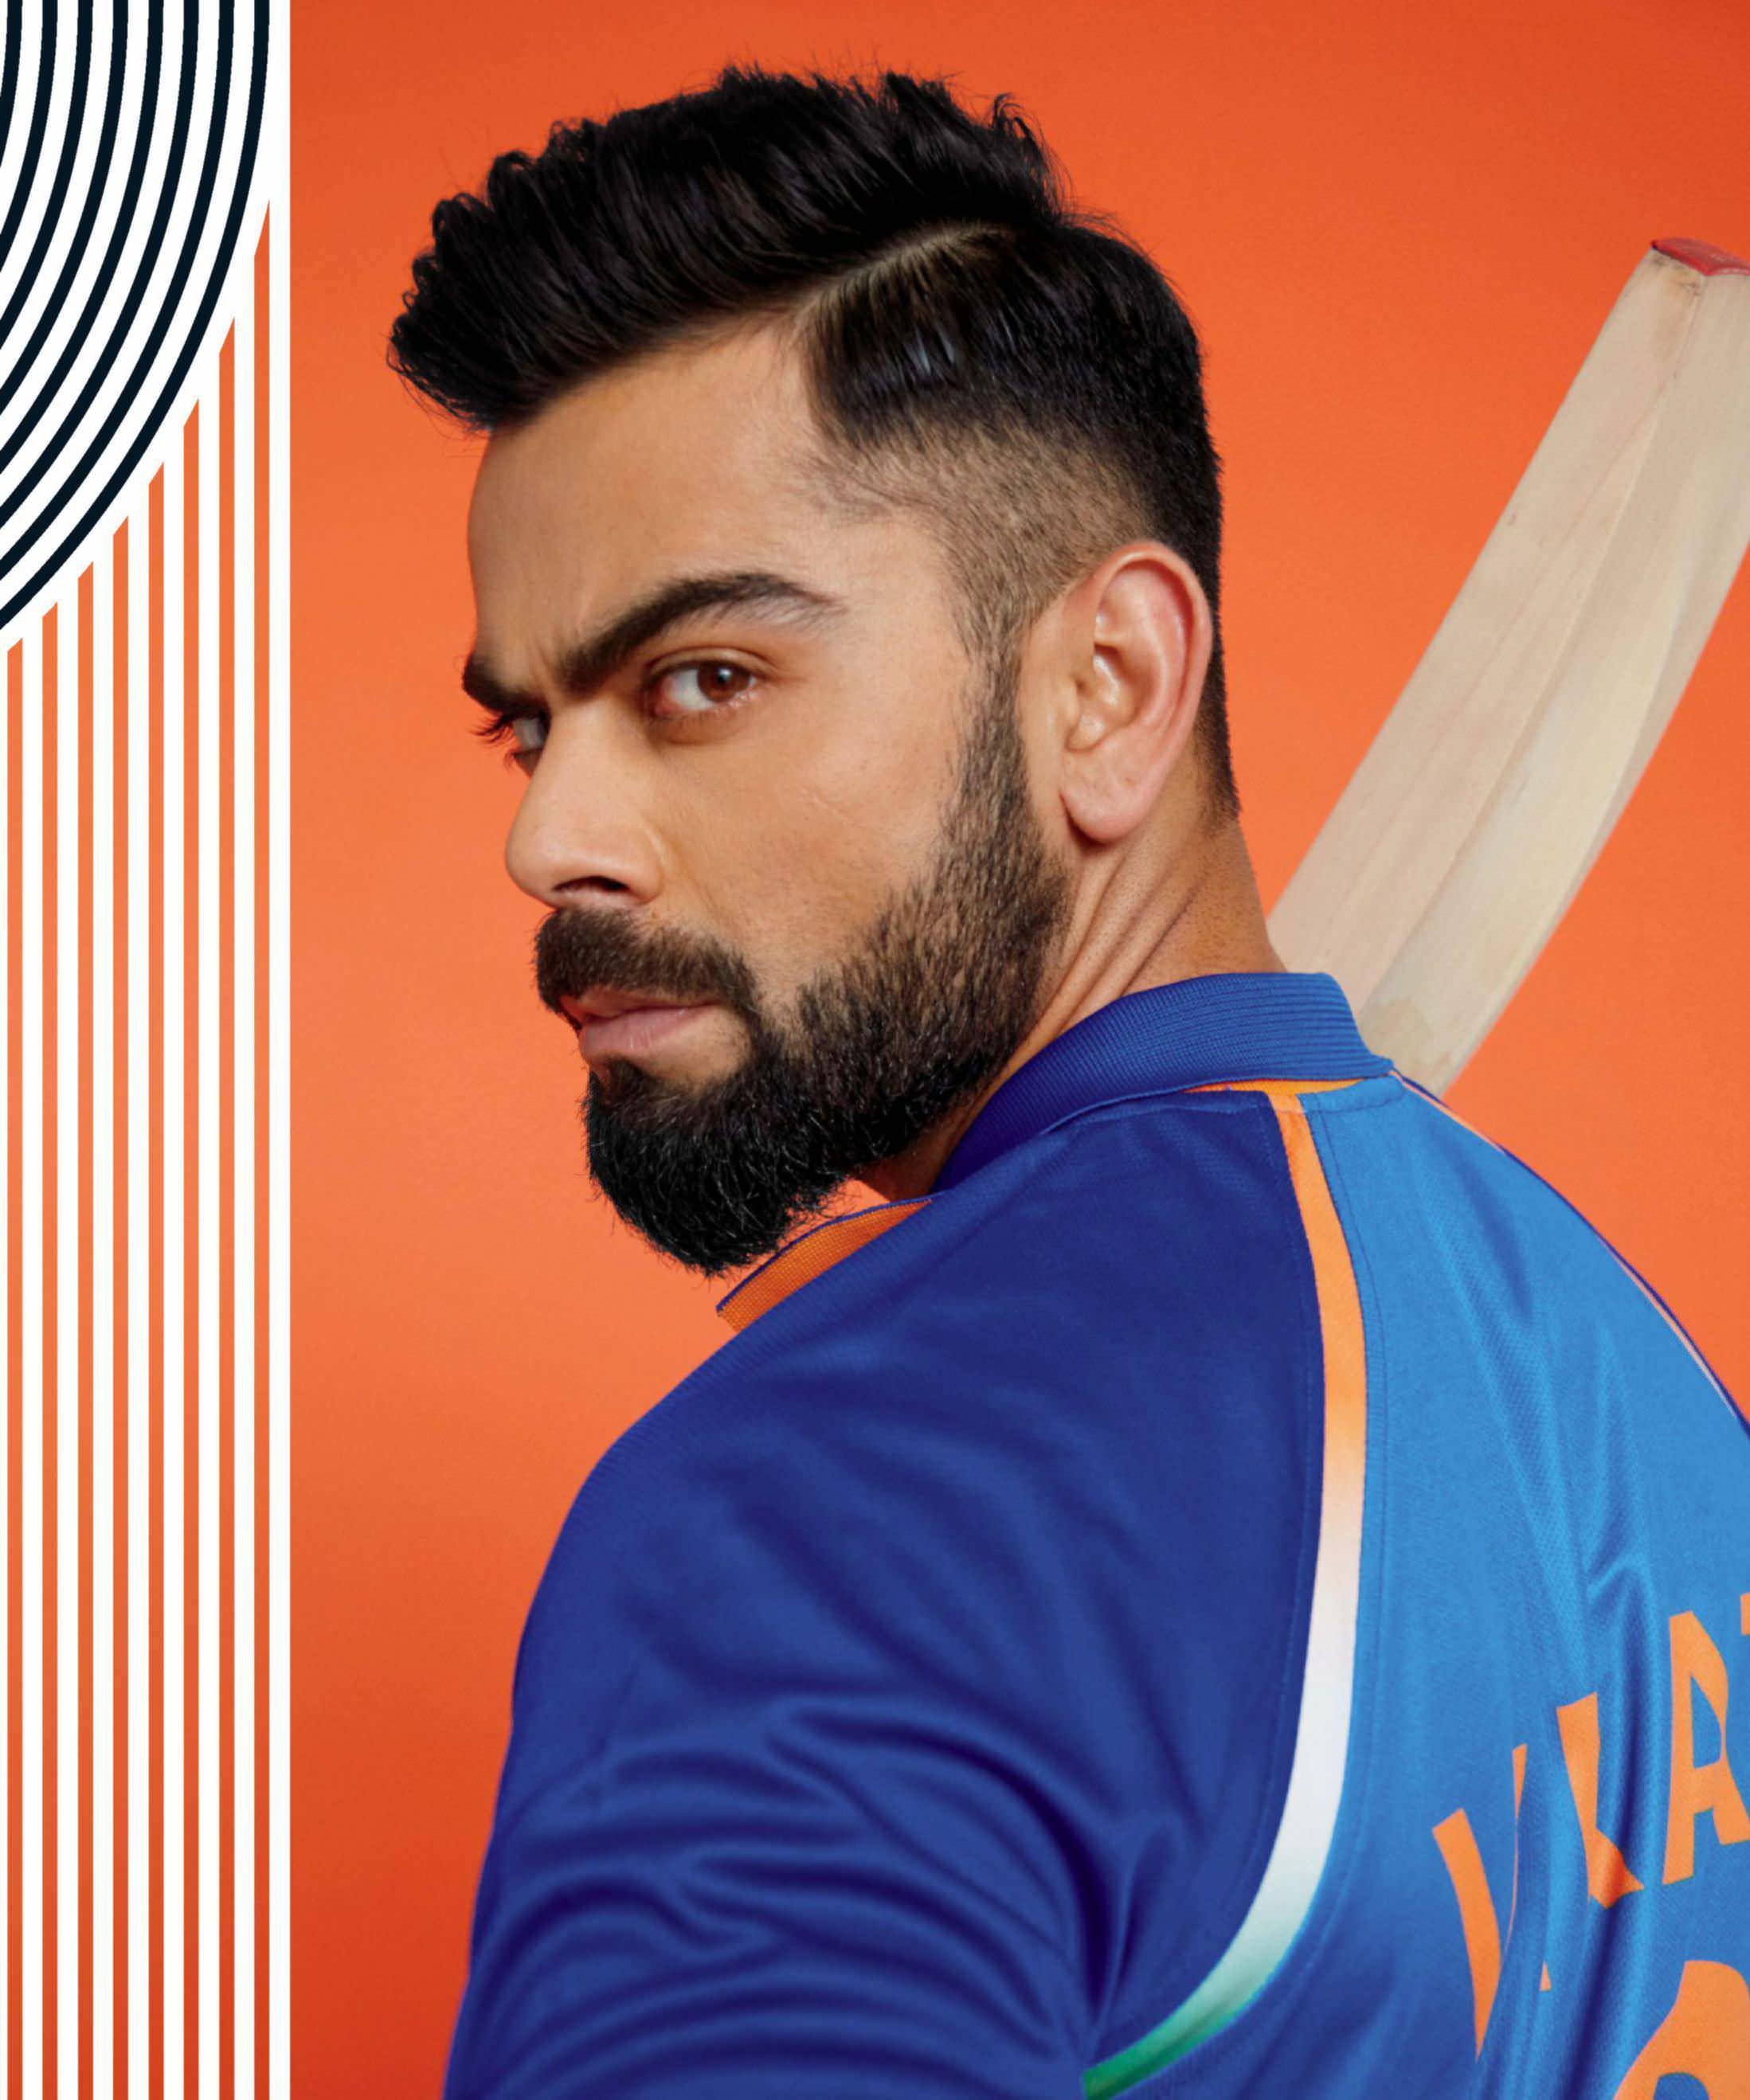 Virat Kohli Cricket IPL 2018 Team India Virat kohli